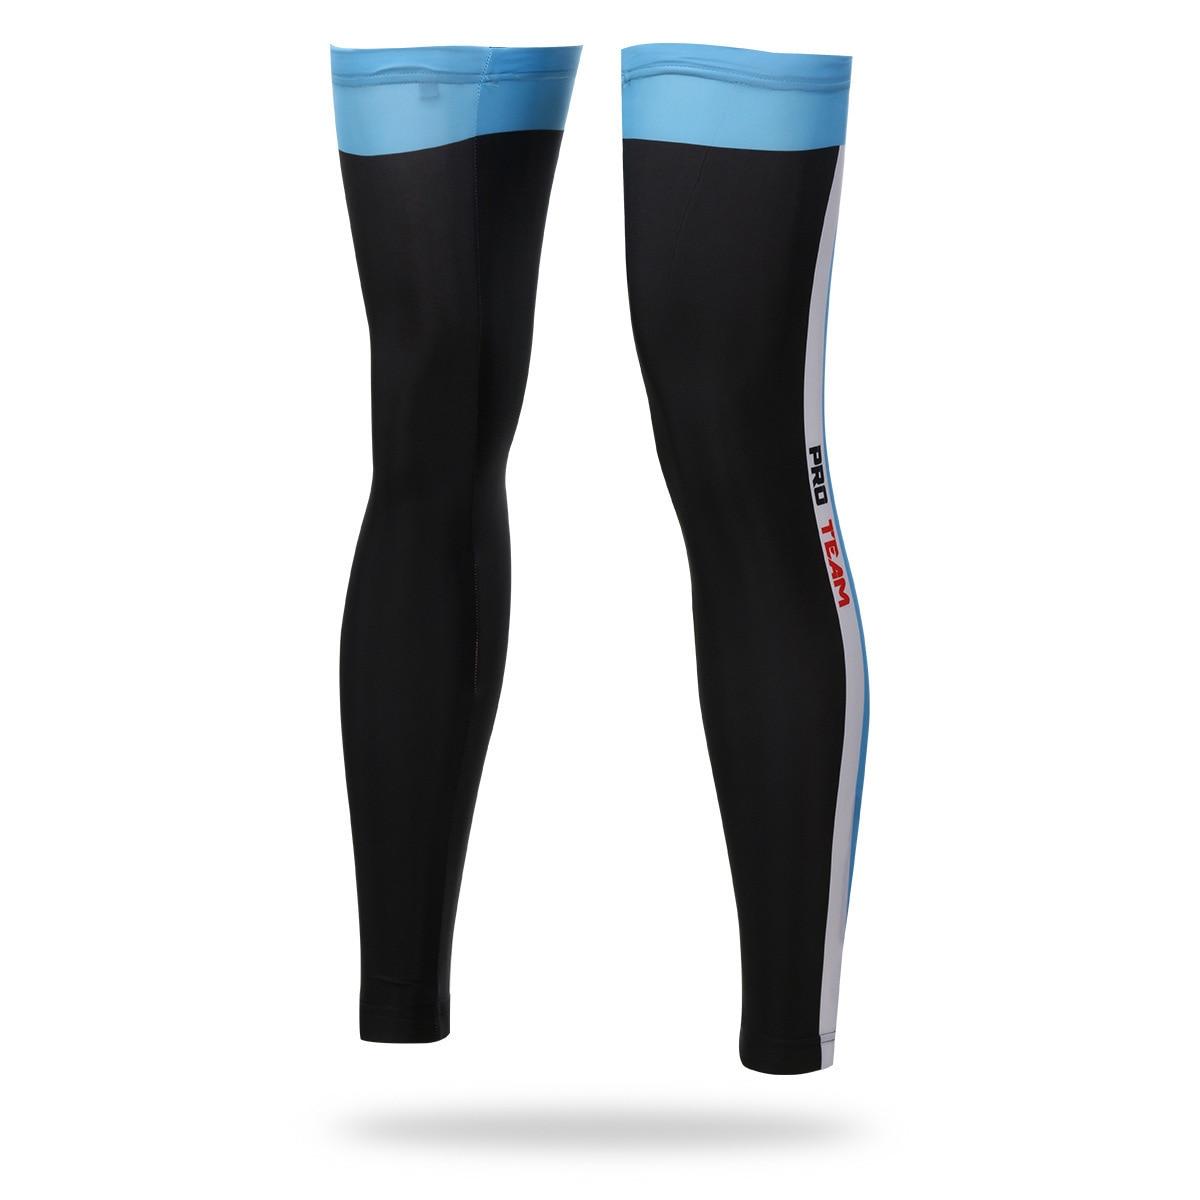 BOODUN The Leader Black Riding Leg Set Cycling Outdoors Sunscreen Leg Set Bicycle Motion Defence Leggings Set